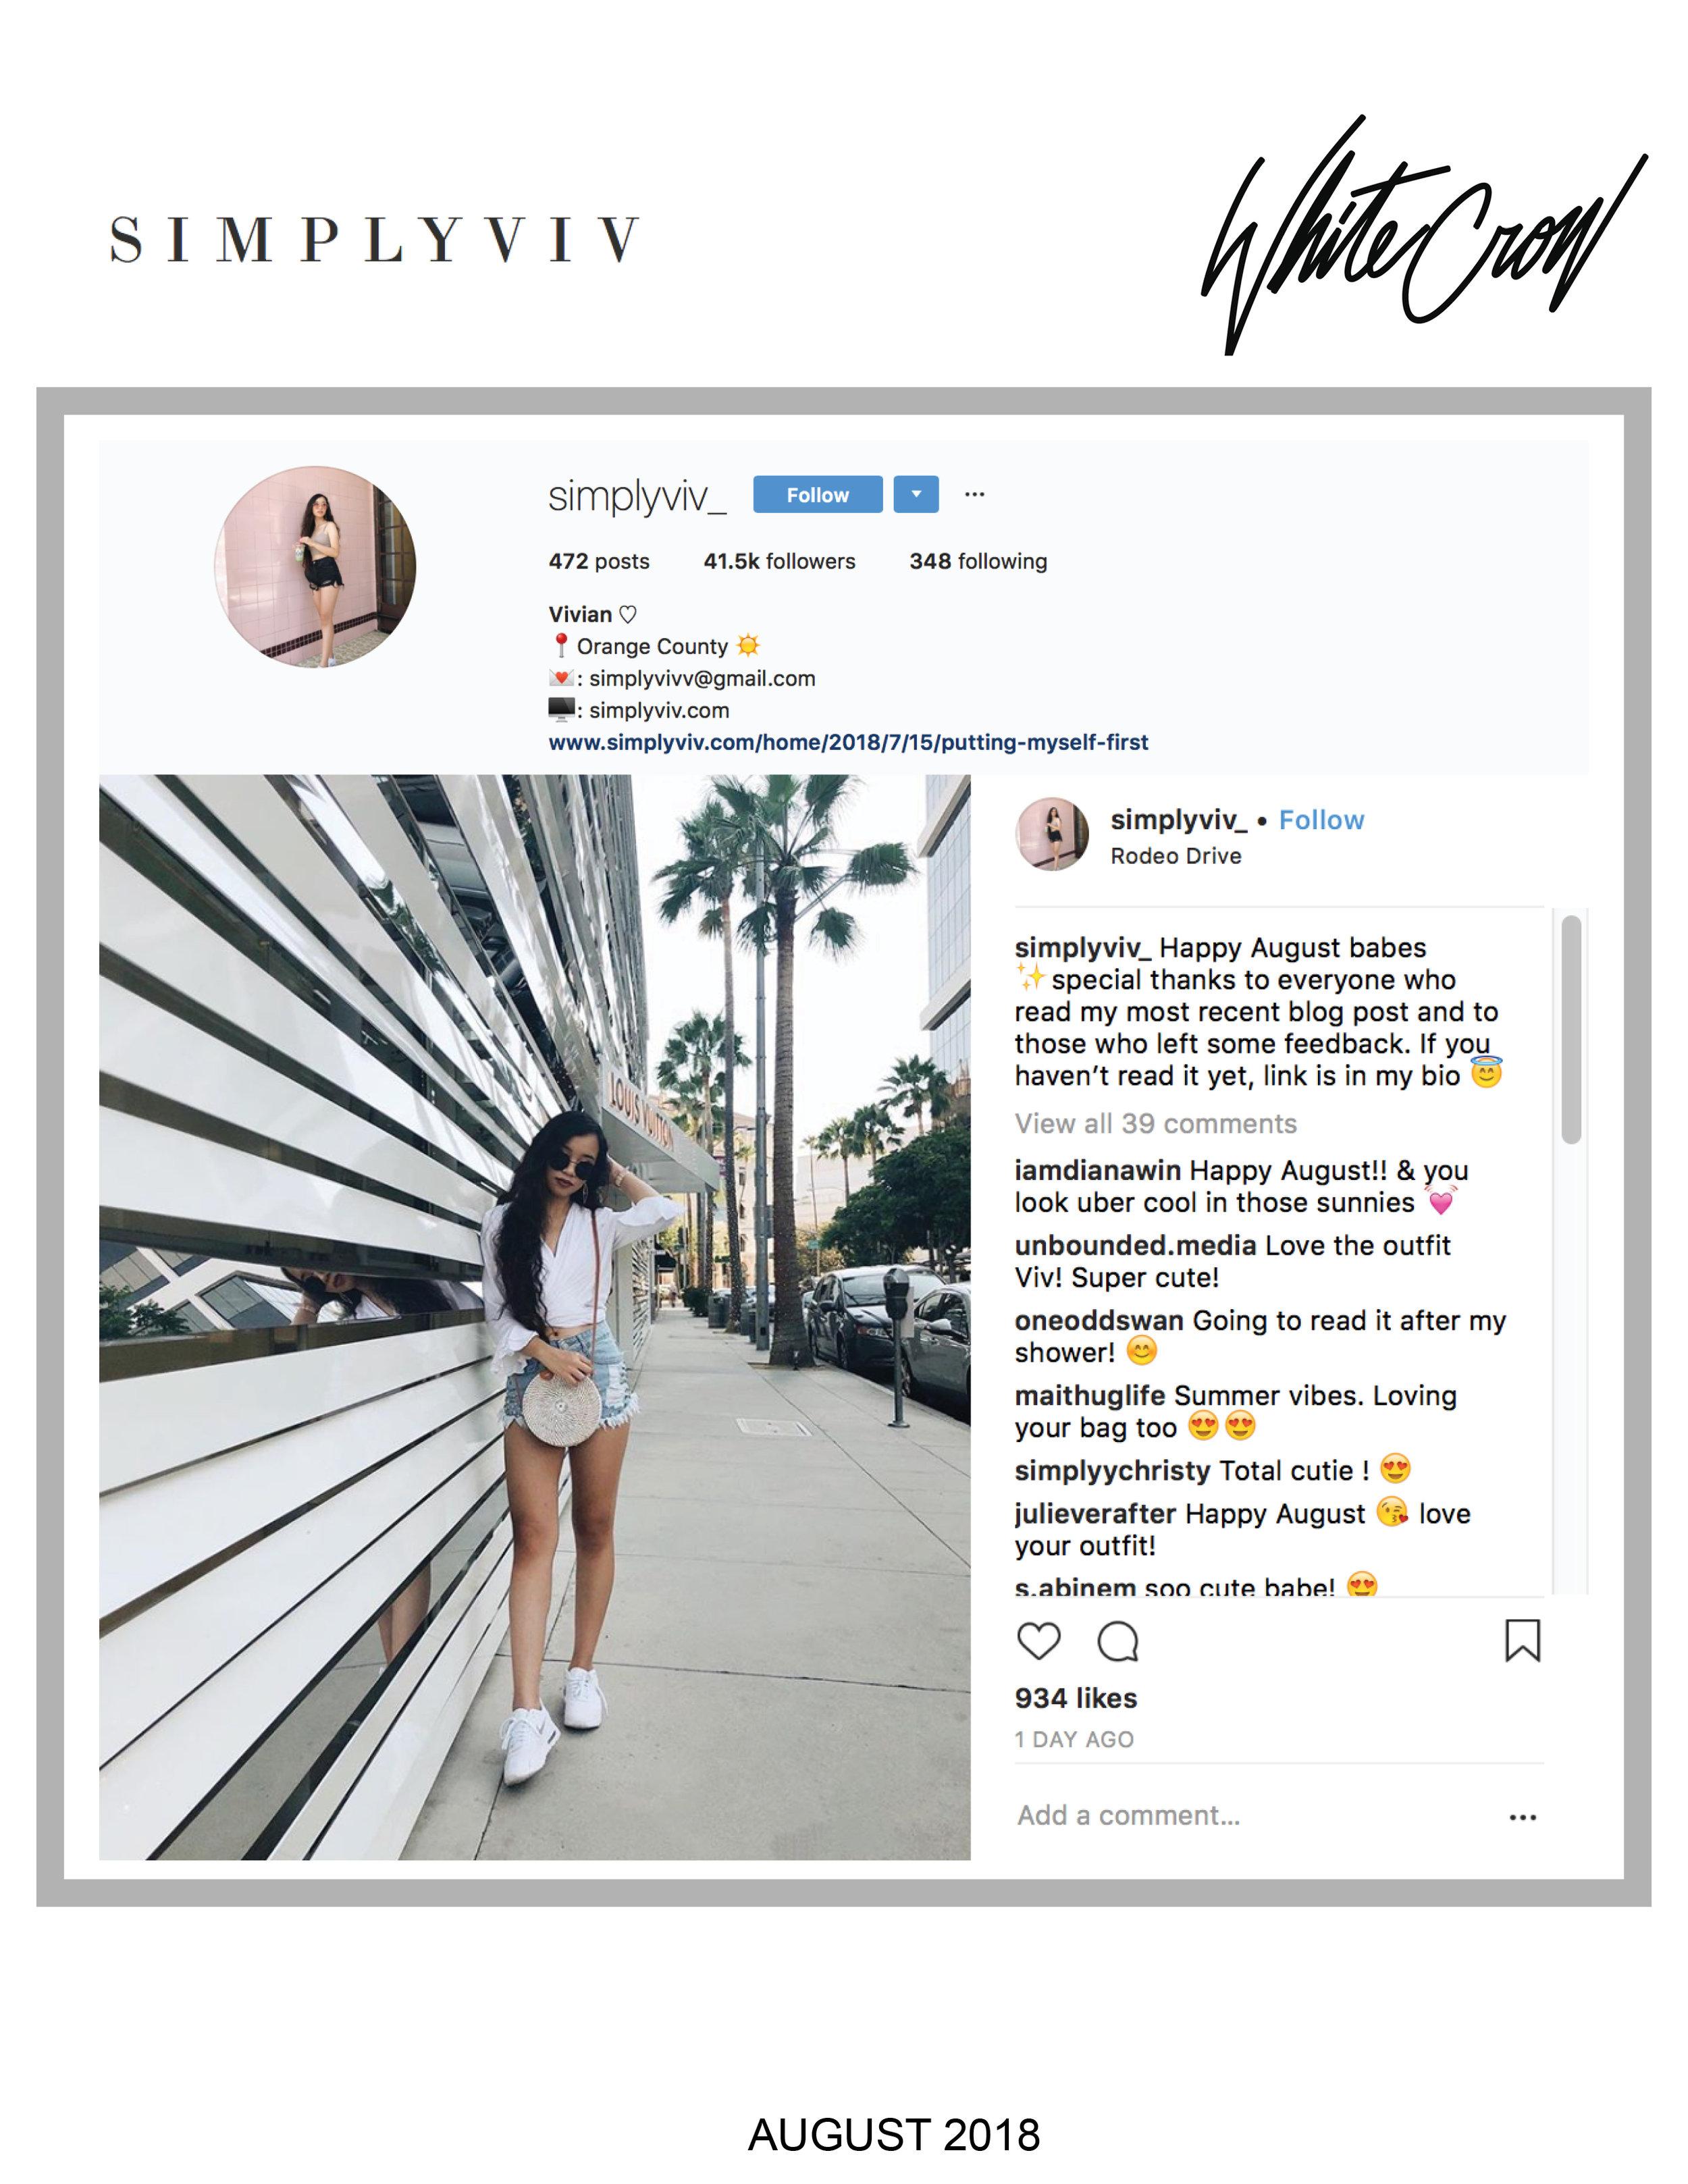 WhiteCrow_Vivian_August2018.jpg